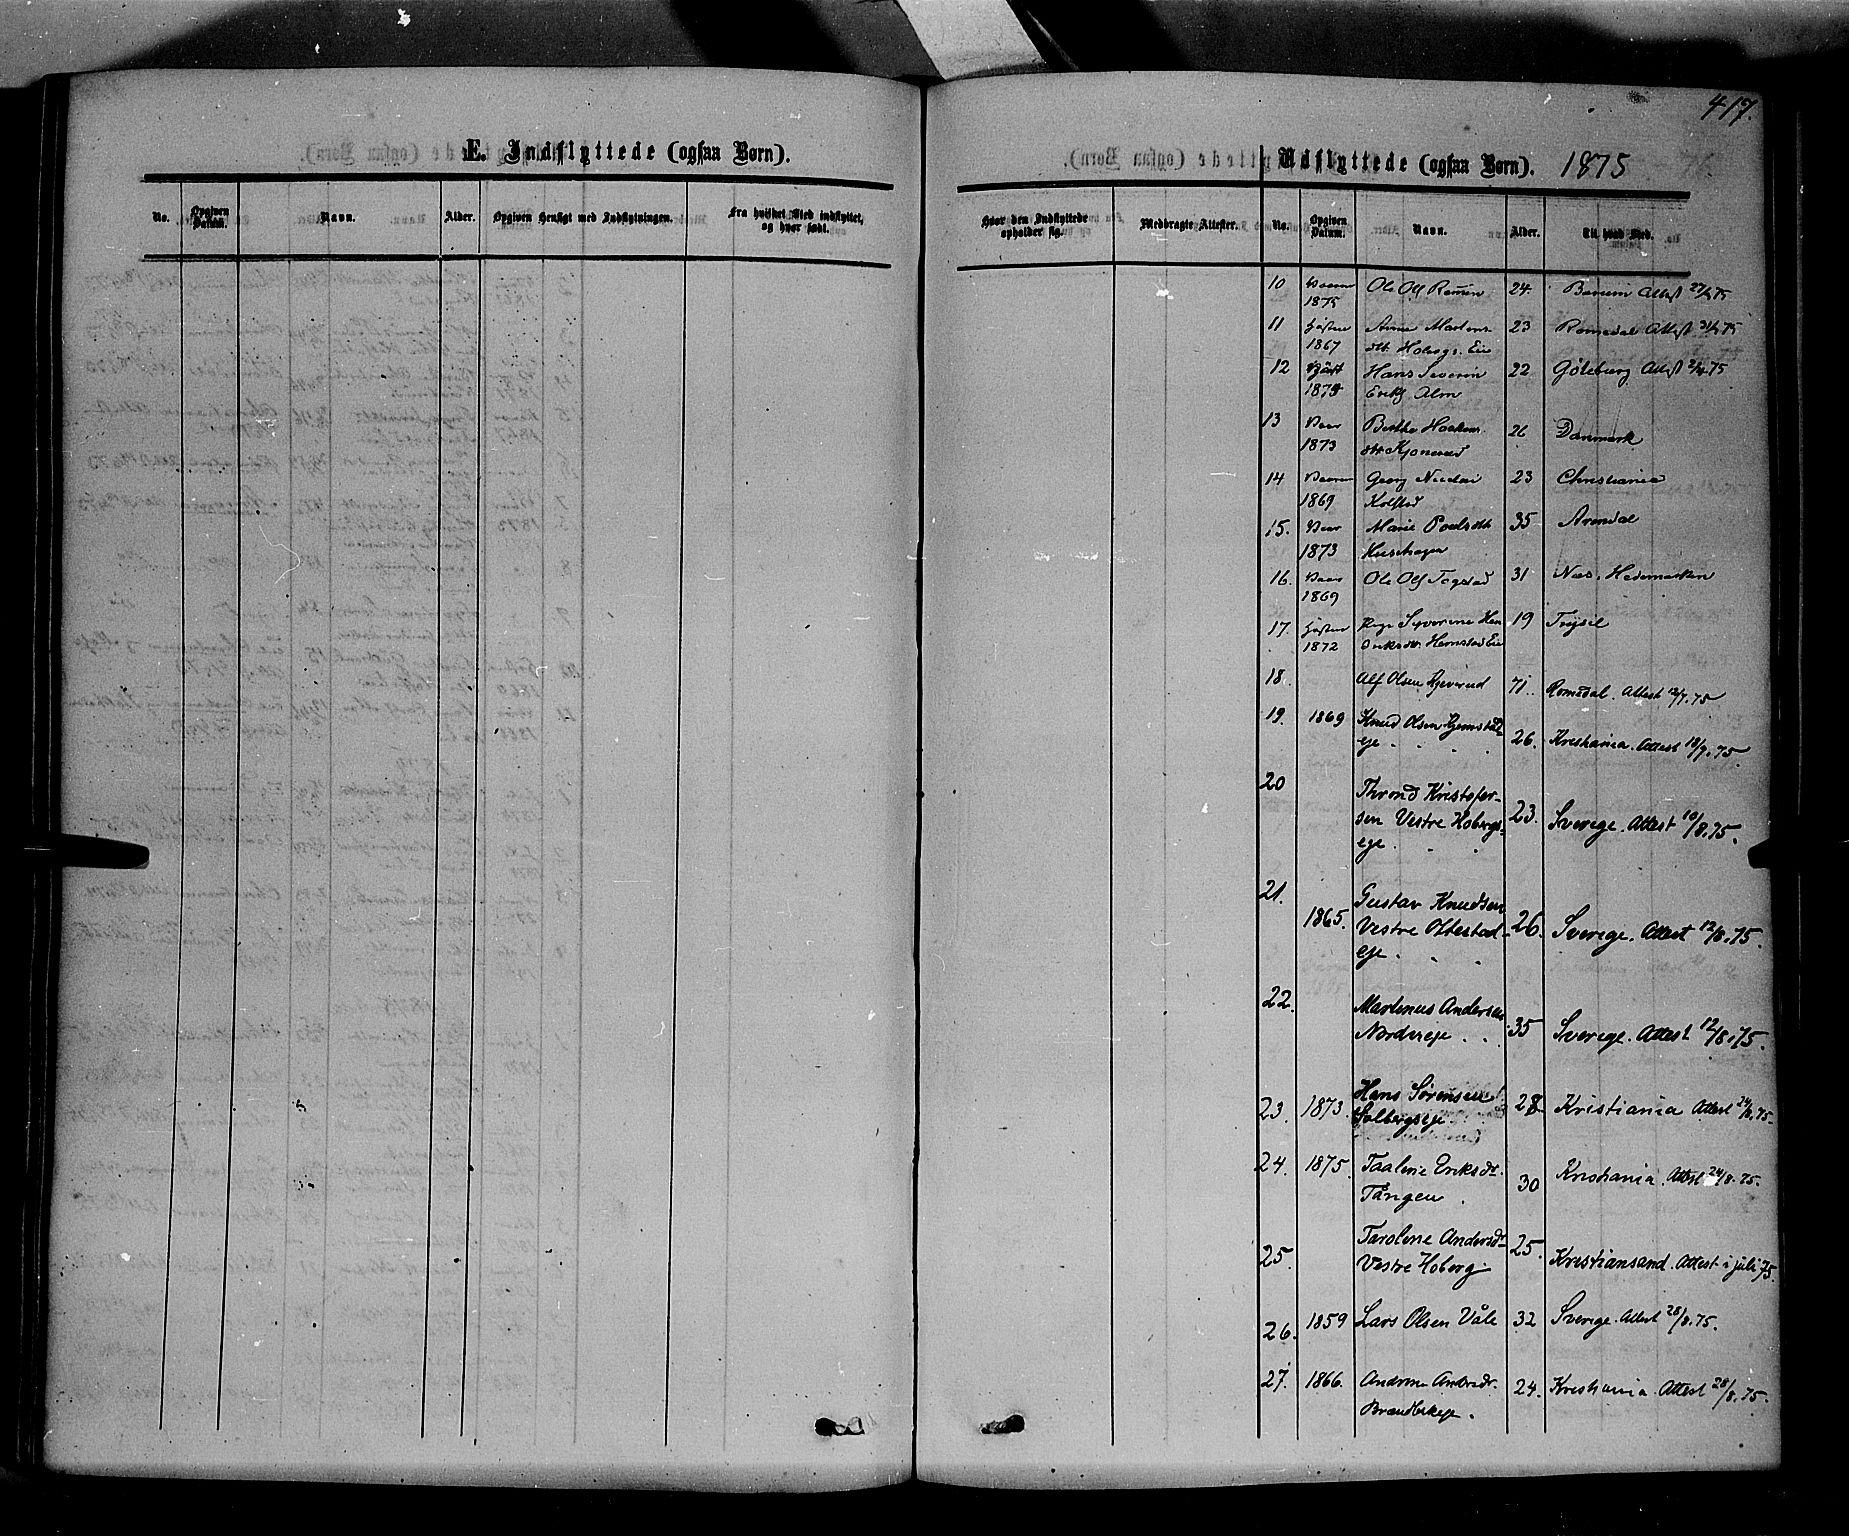 SAH, Stange prestekontor, K/L0013: Ministerialbok nr. 13, 1862-1879, s. 417